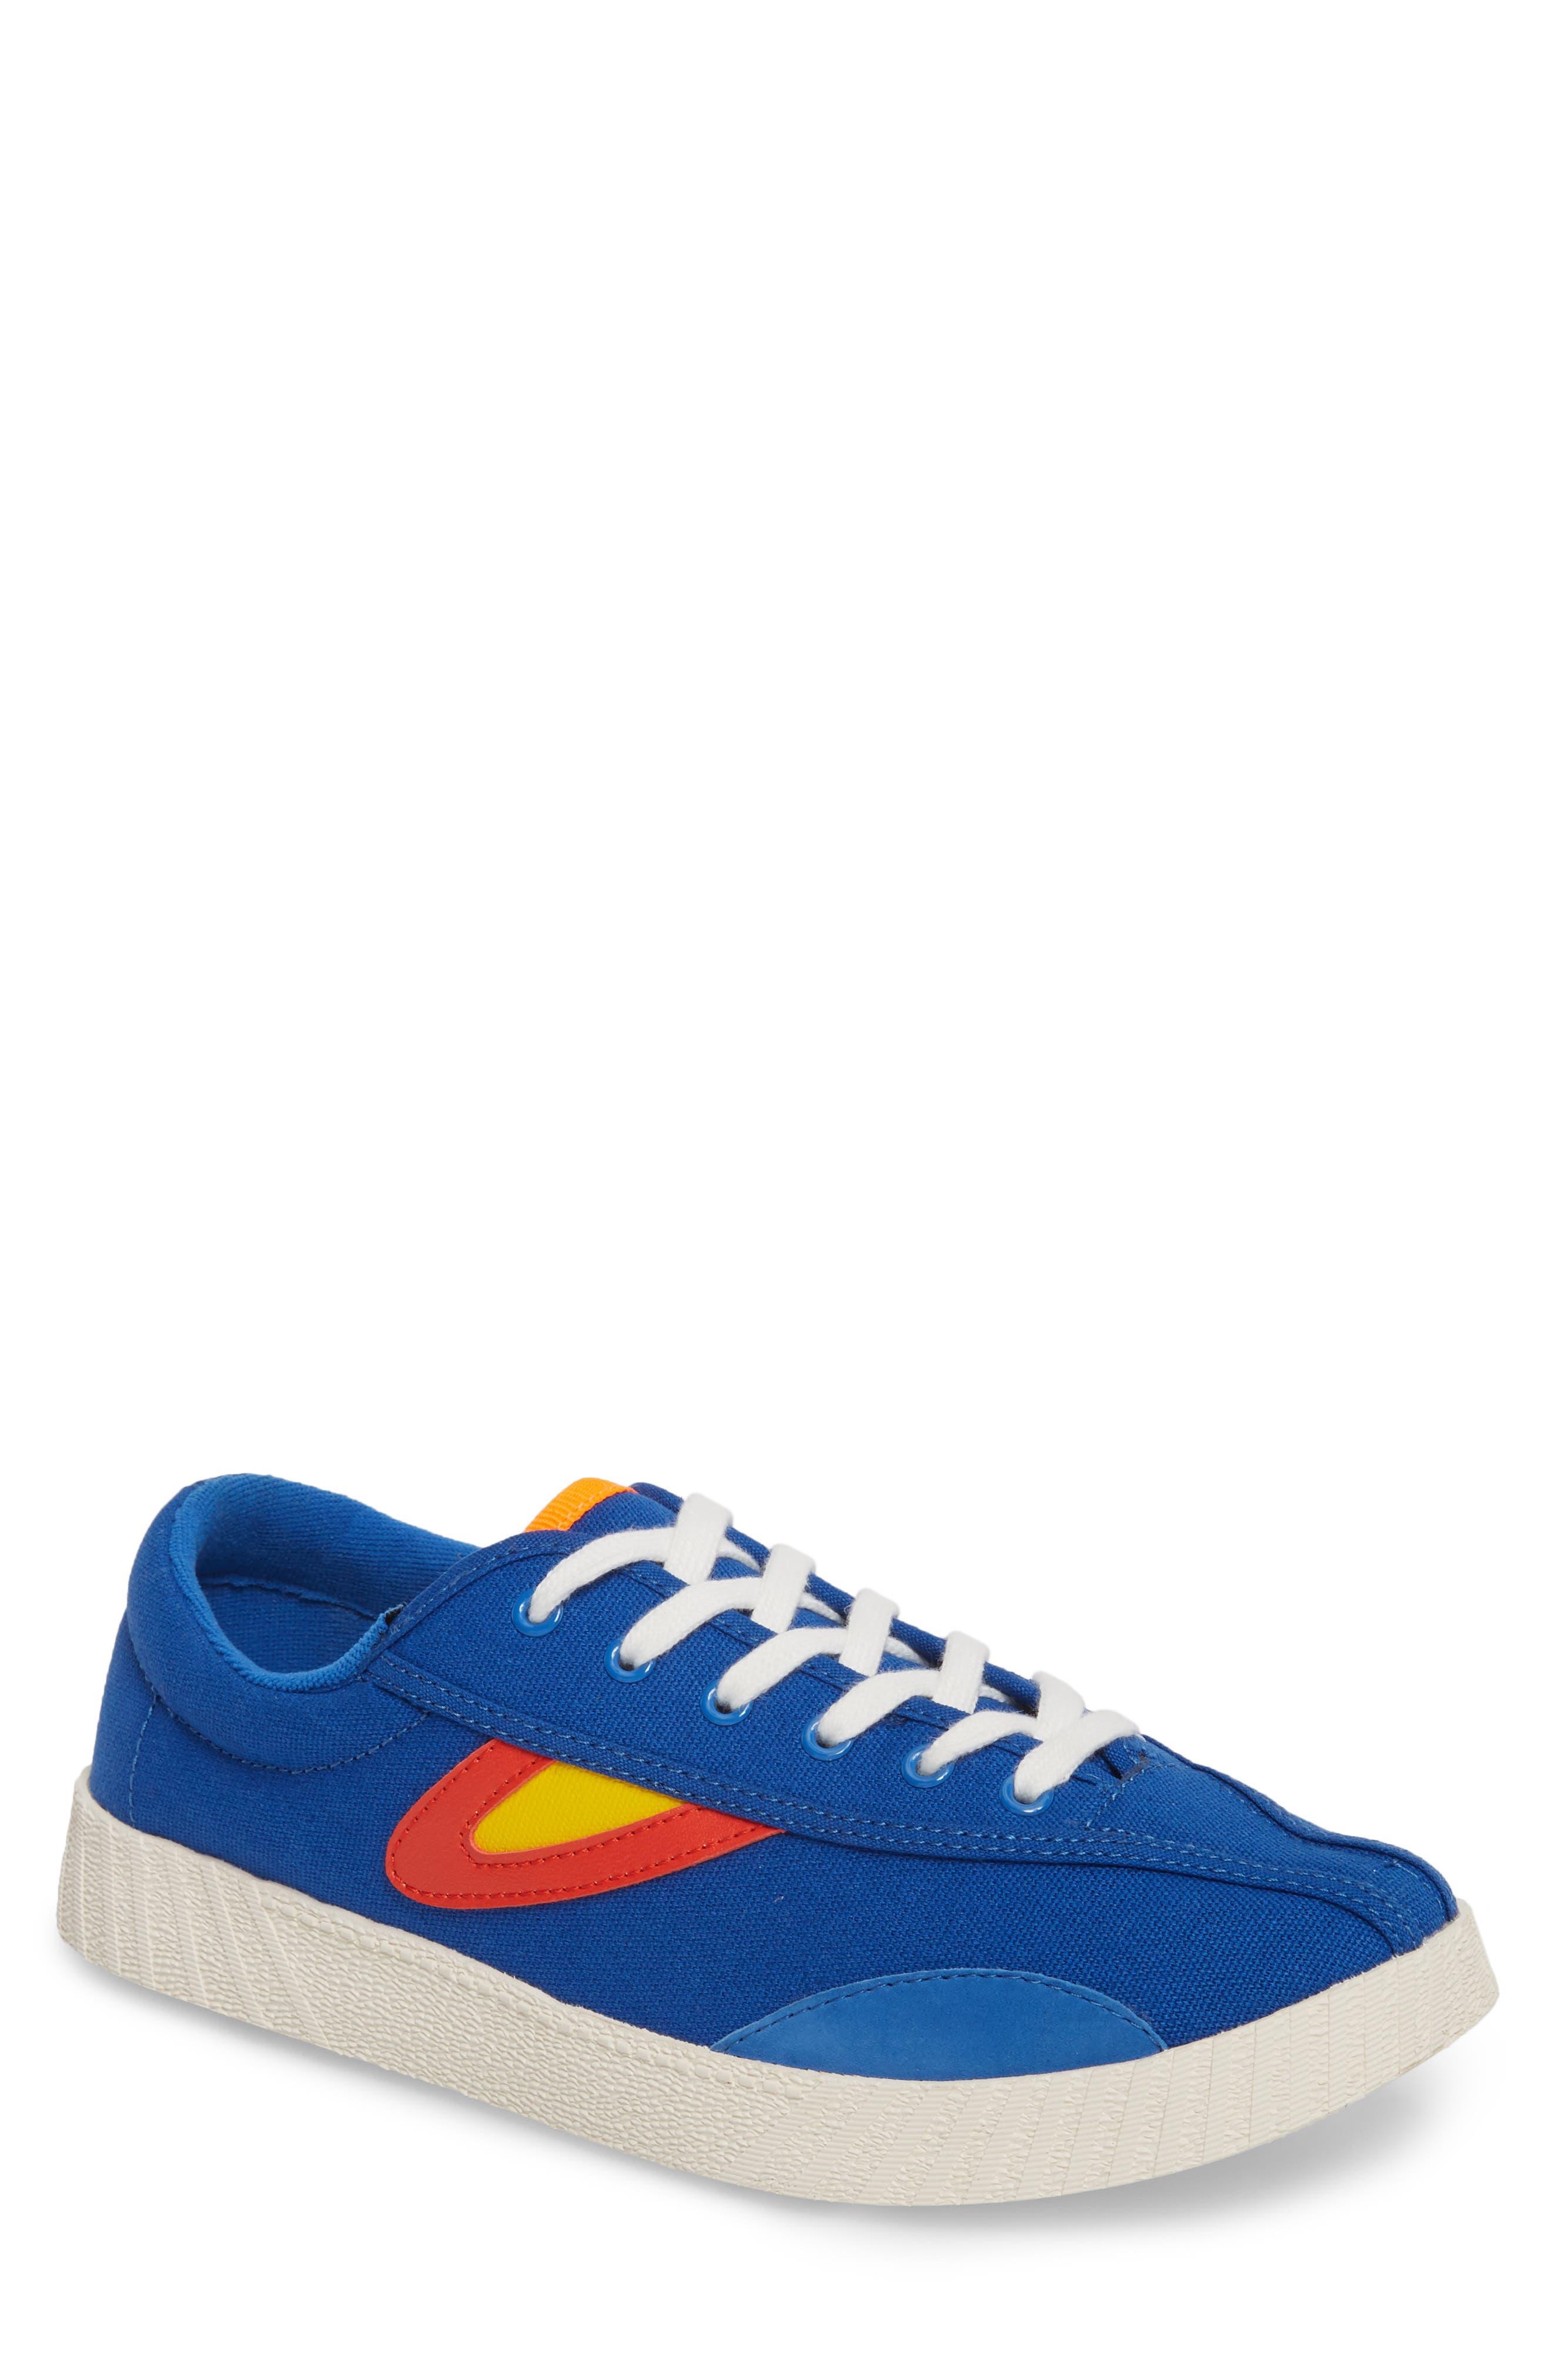 Alternate Image 1 Selected - Tretorn Andre 3000 Nylite Low Top Sneaker (Men)